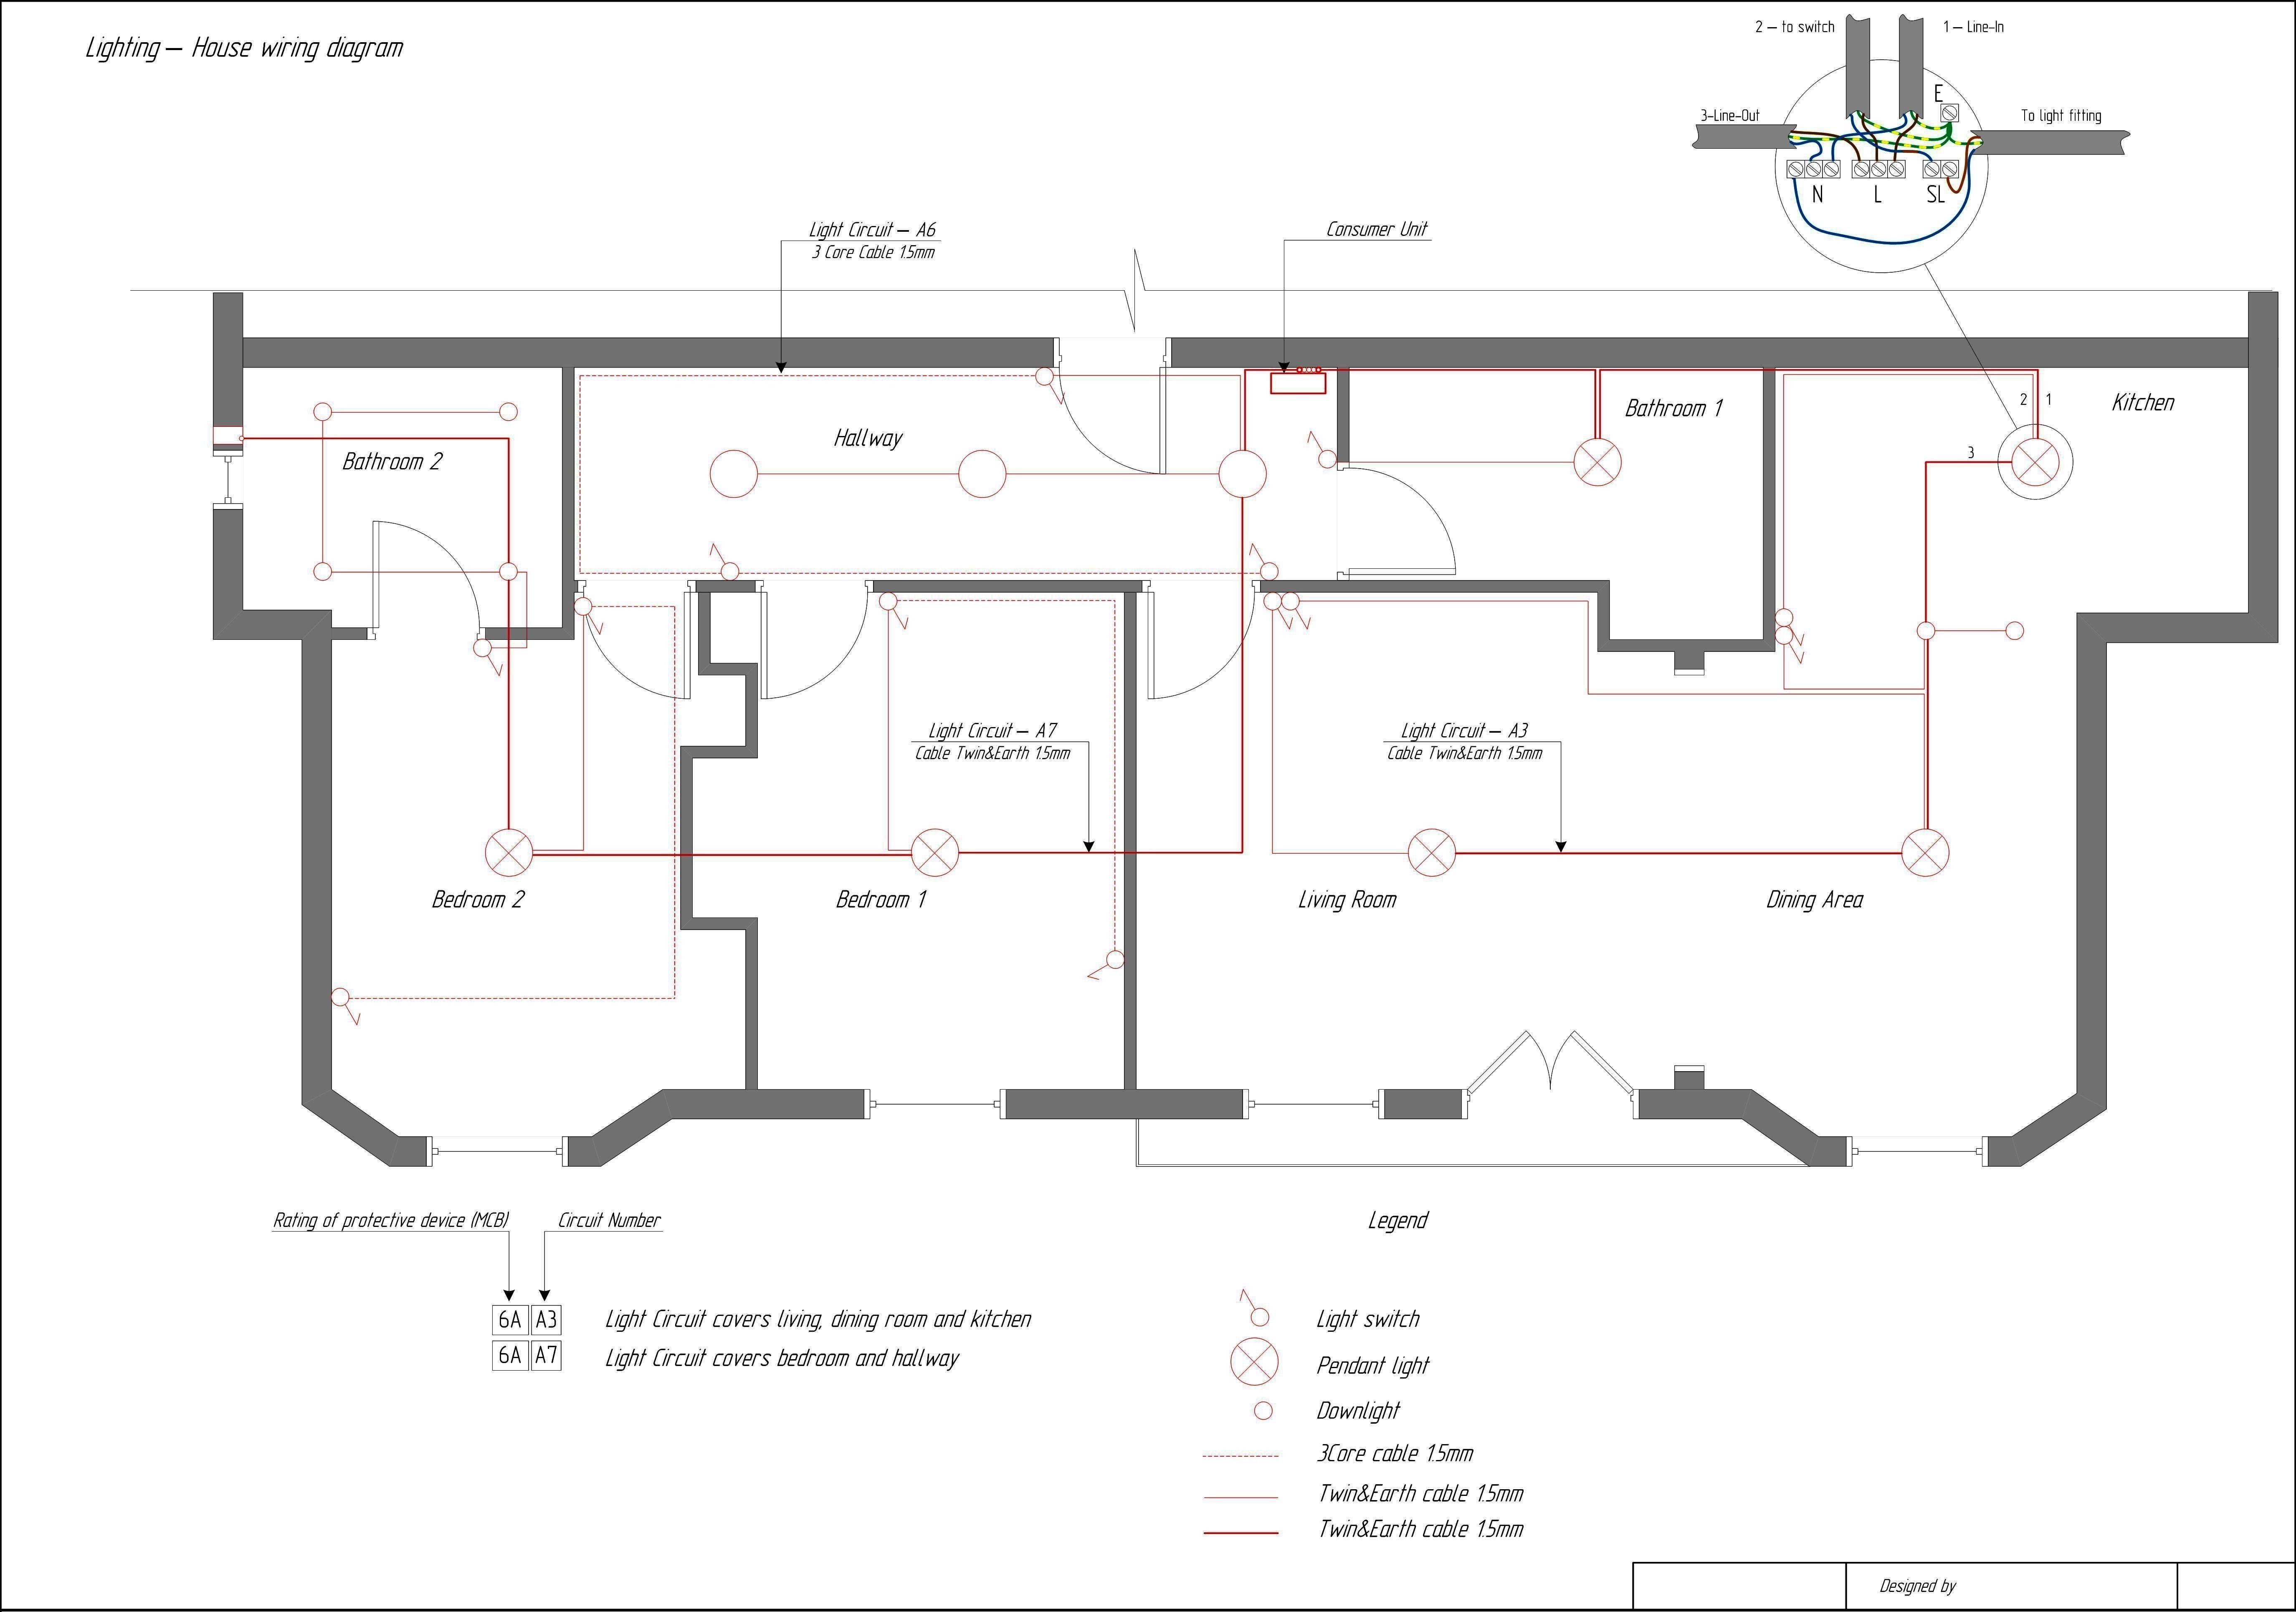 17 good electrical circuit diagram house wiring ideas   house wiring,  electrical circuit diagram, electrical wiring diagram  pinterest